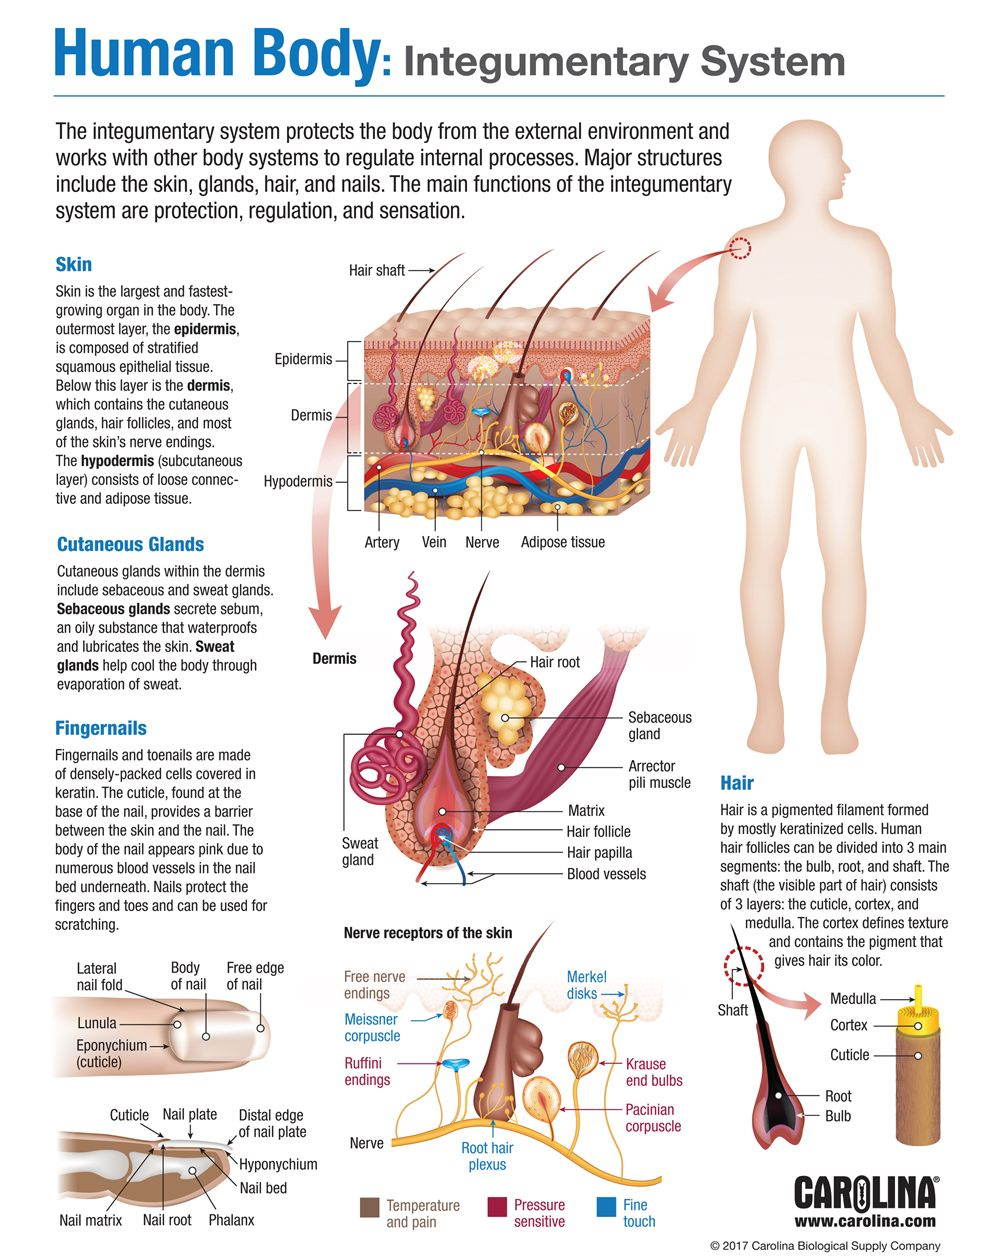 Human Body Integumentary System Carolina